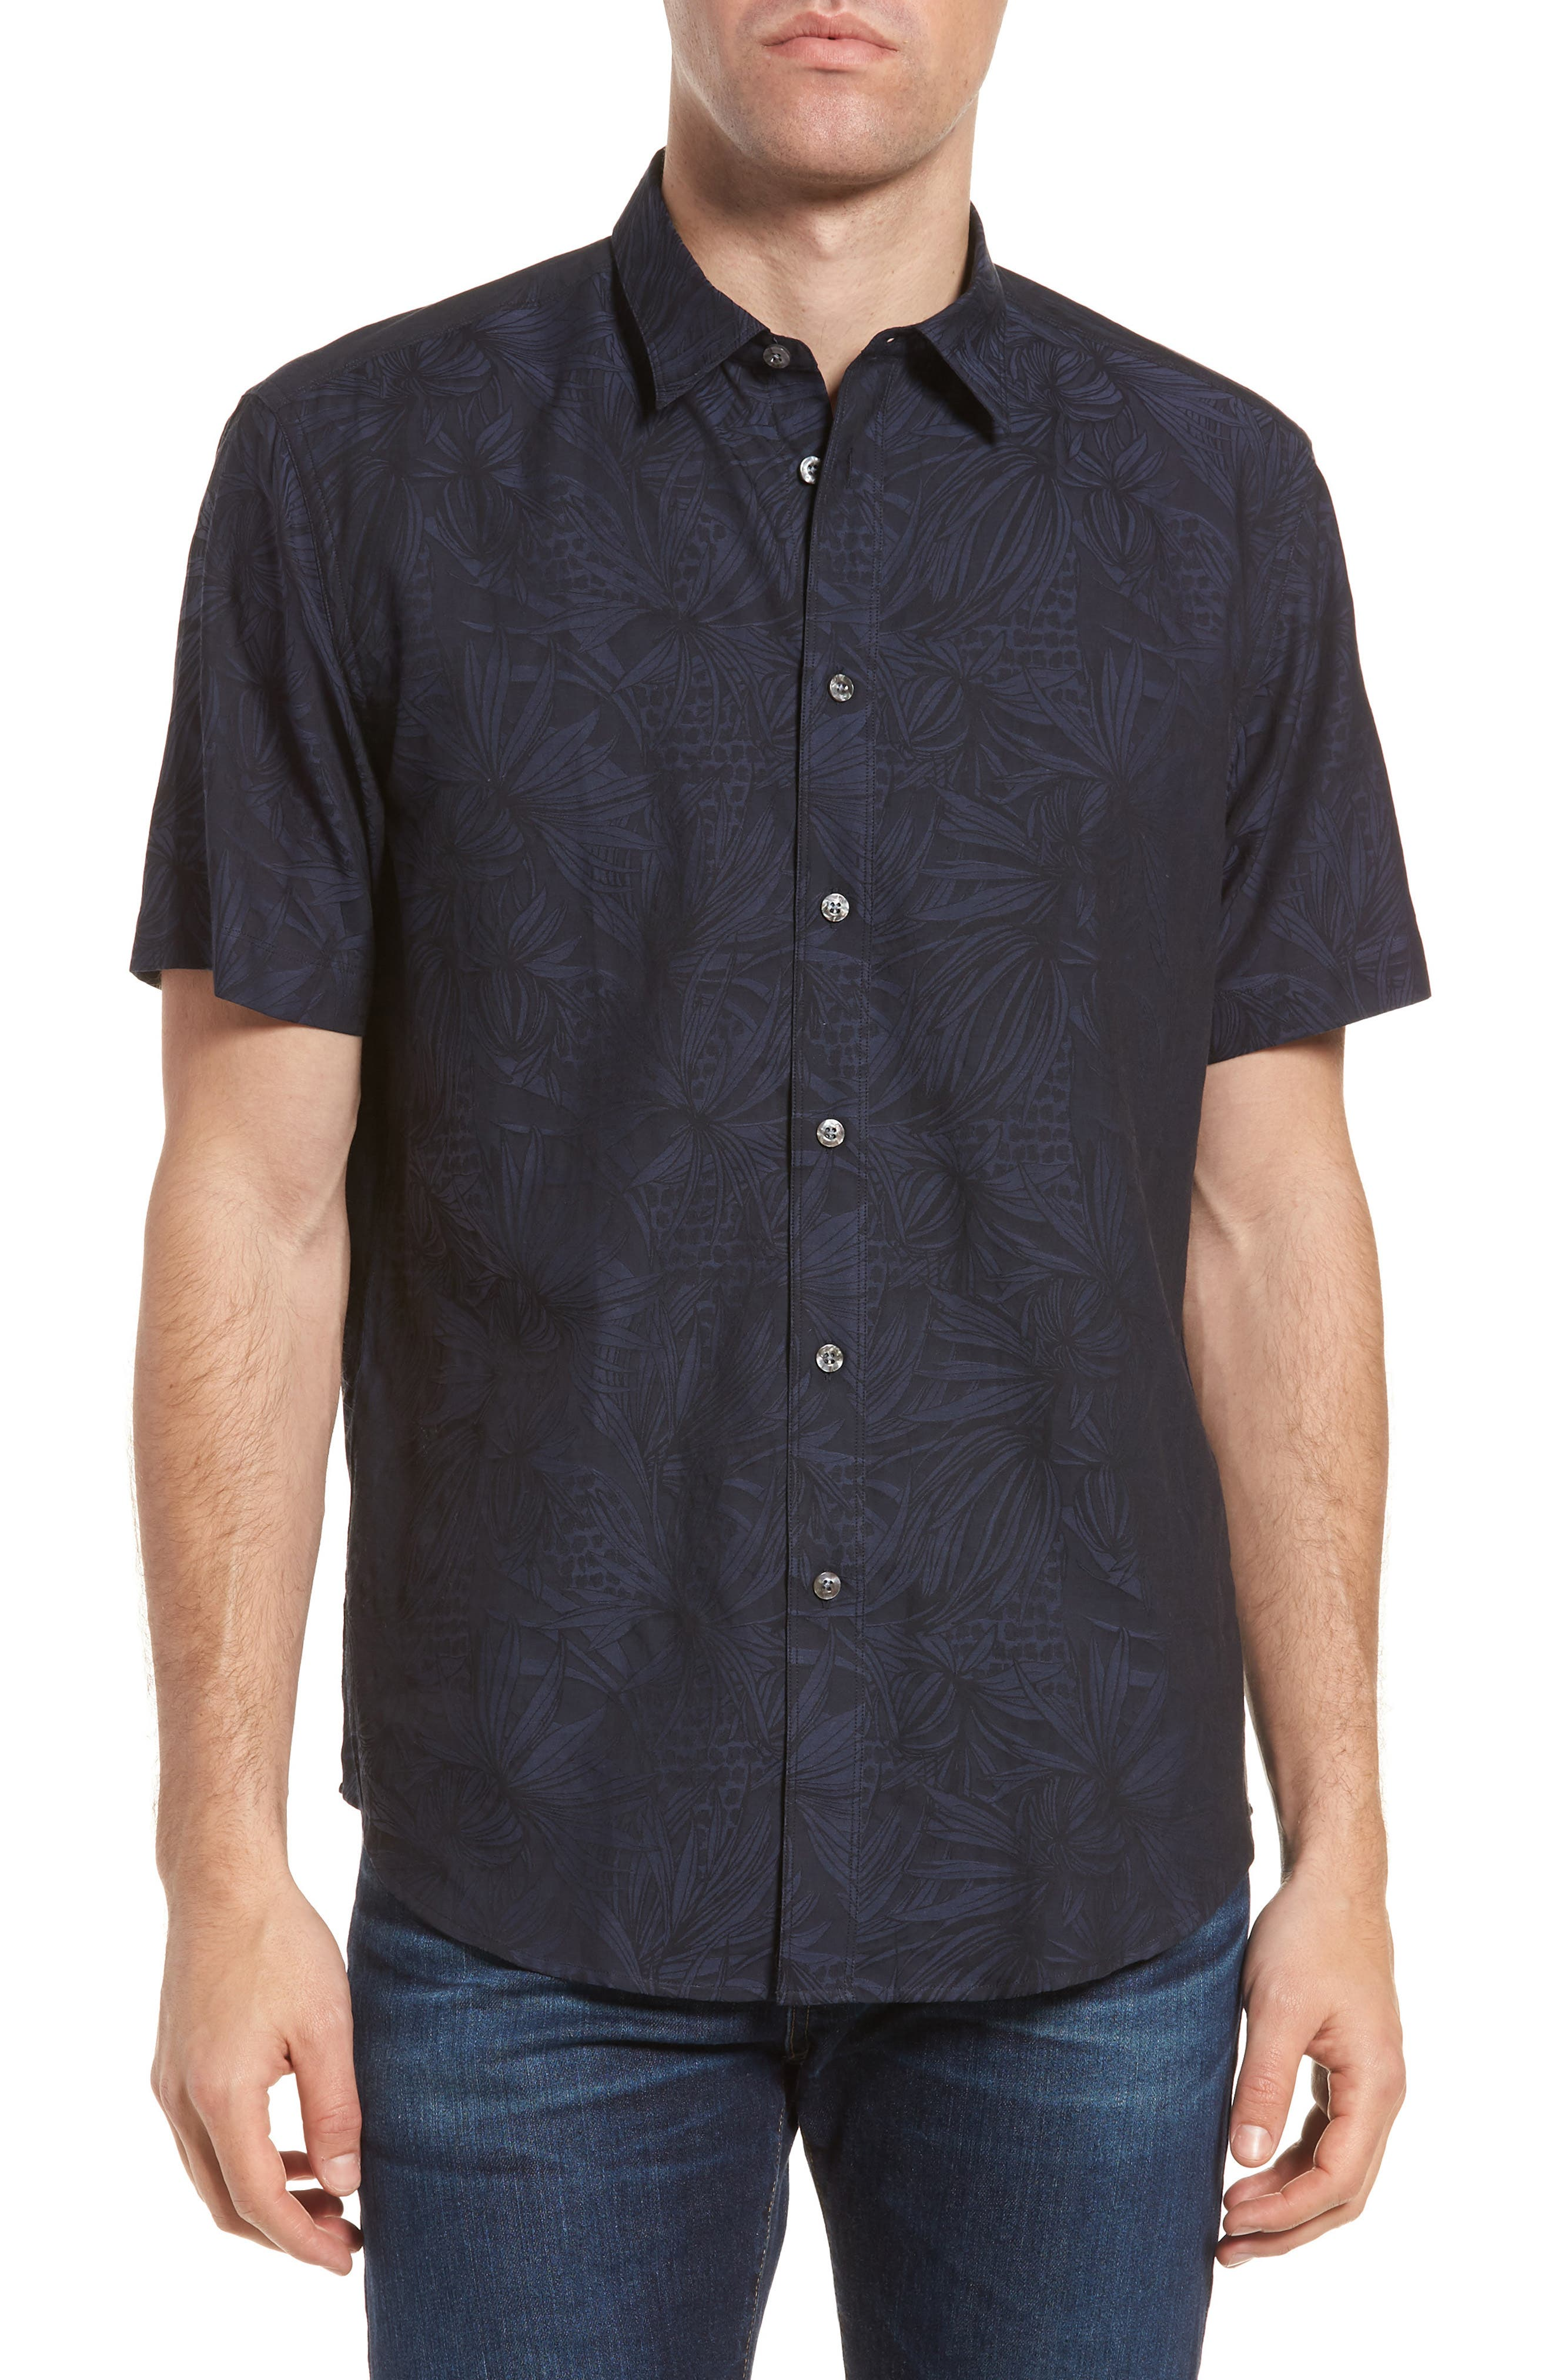 Coastaoro Princeville Regular Fit Print Short Sleeve Sport Shirt